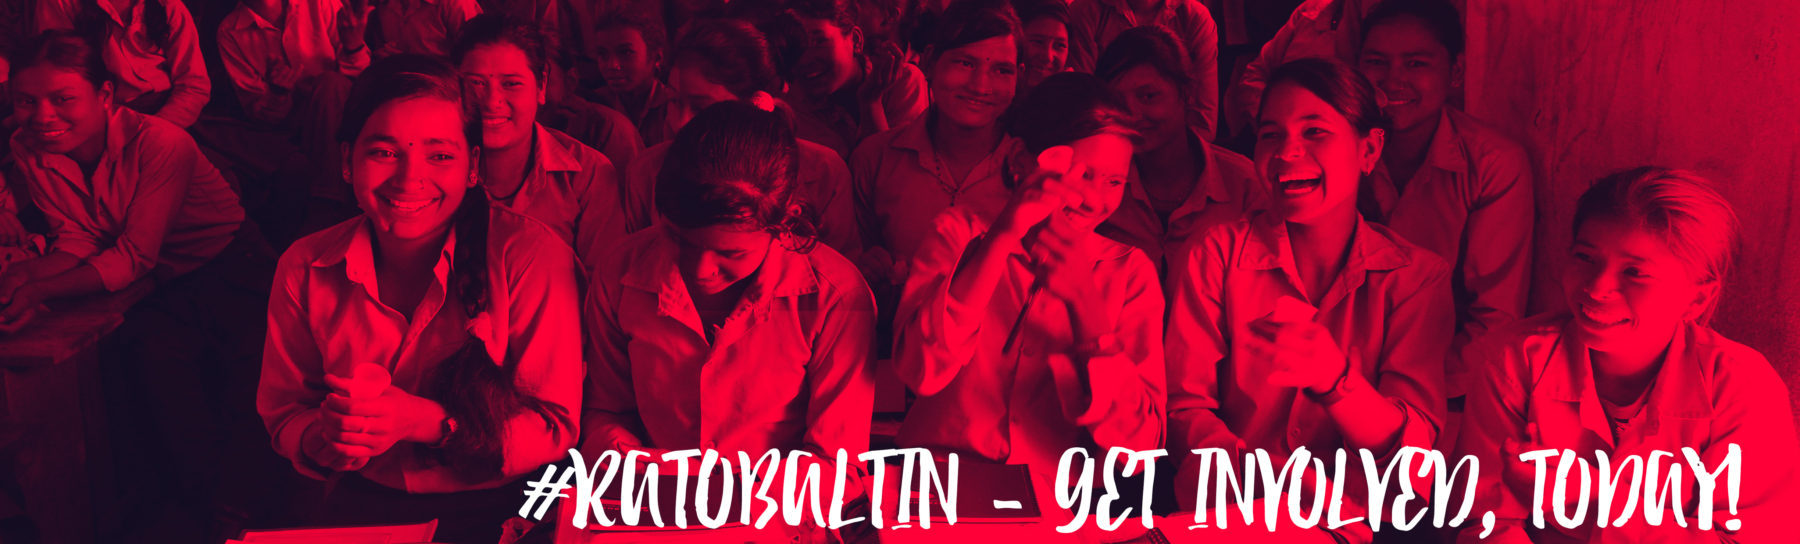 #RatoBaltin - Get involved, today!